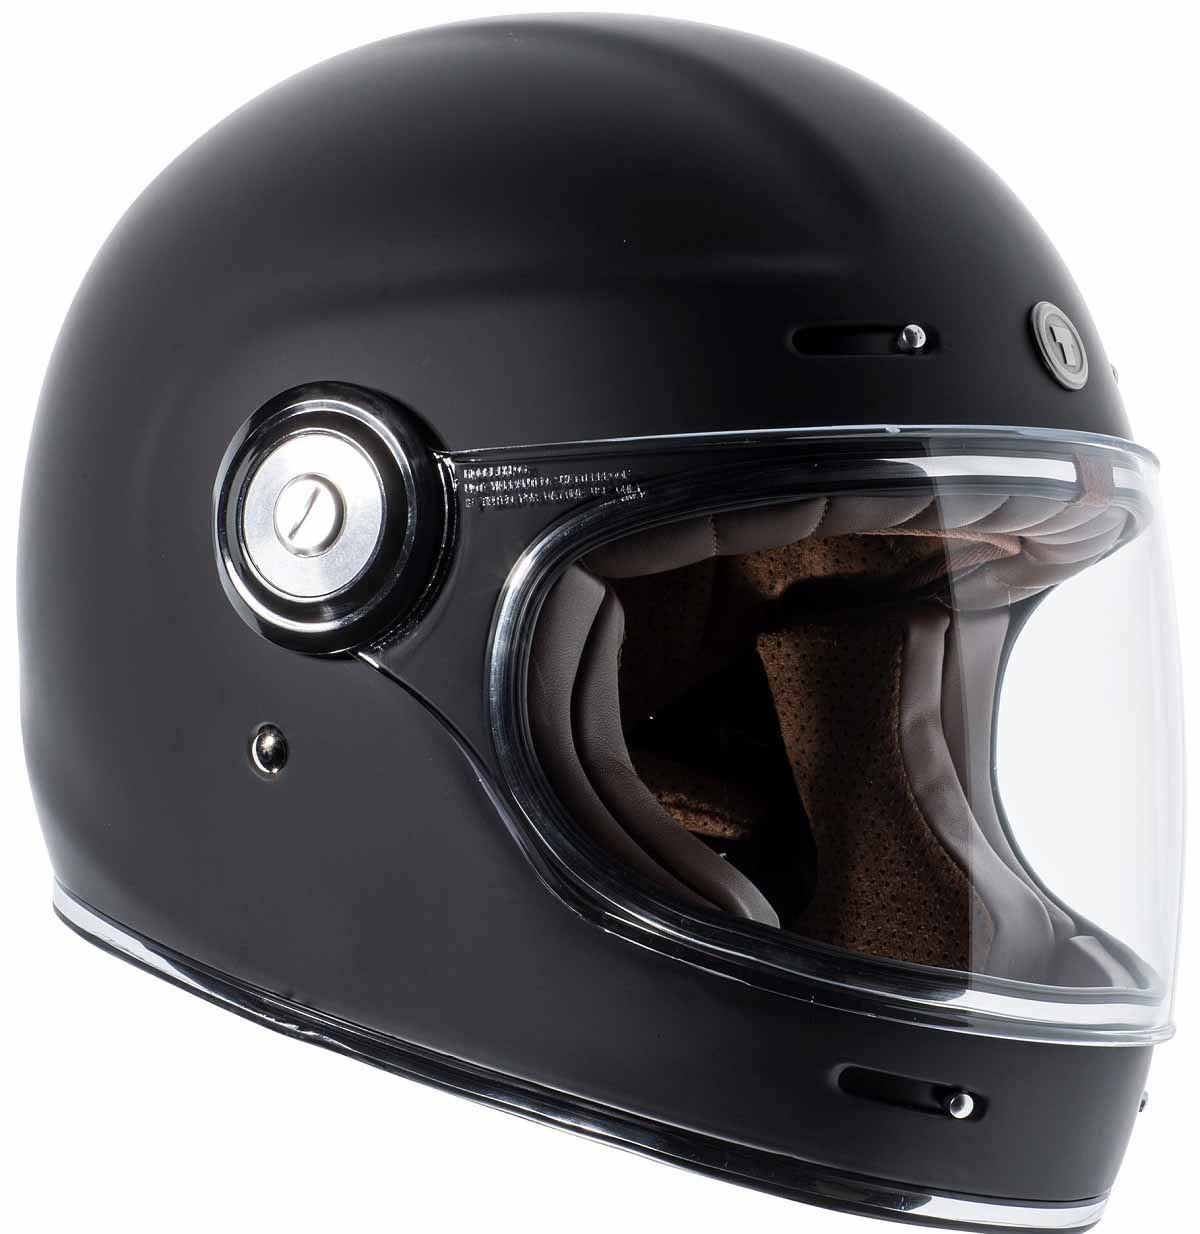 miniature 3 - Torc T1 Helmet Retro Vintage Style Fiberglass DOT Approved XS-2XL